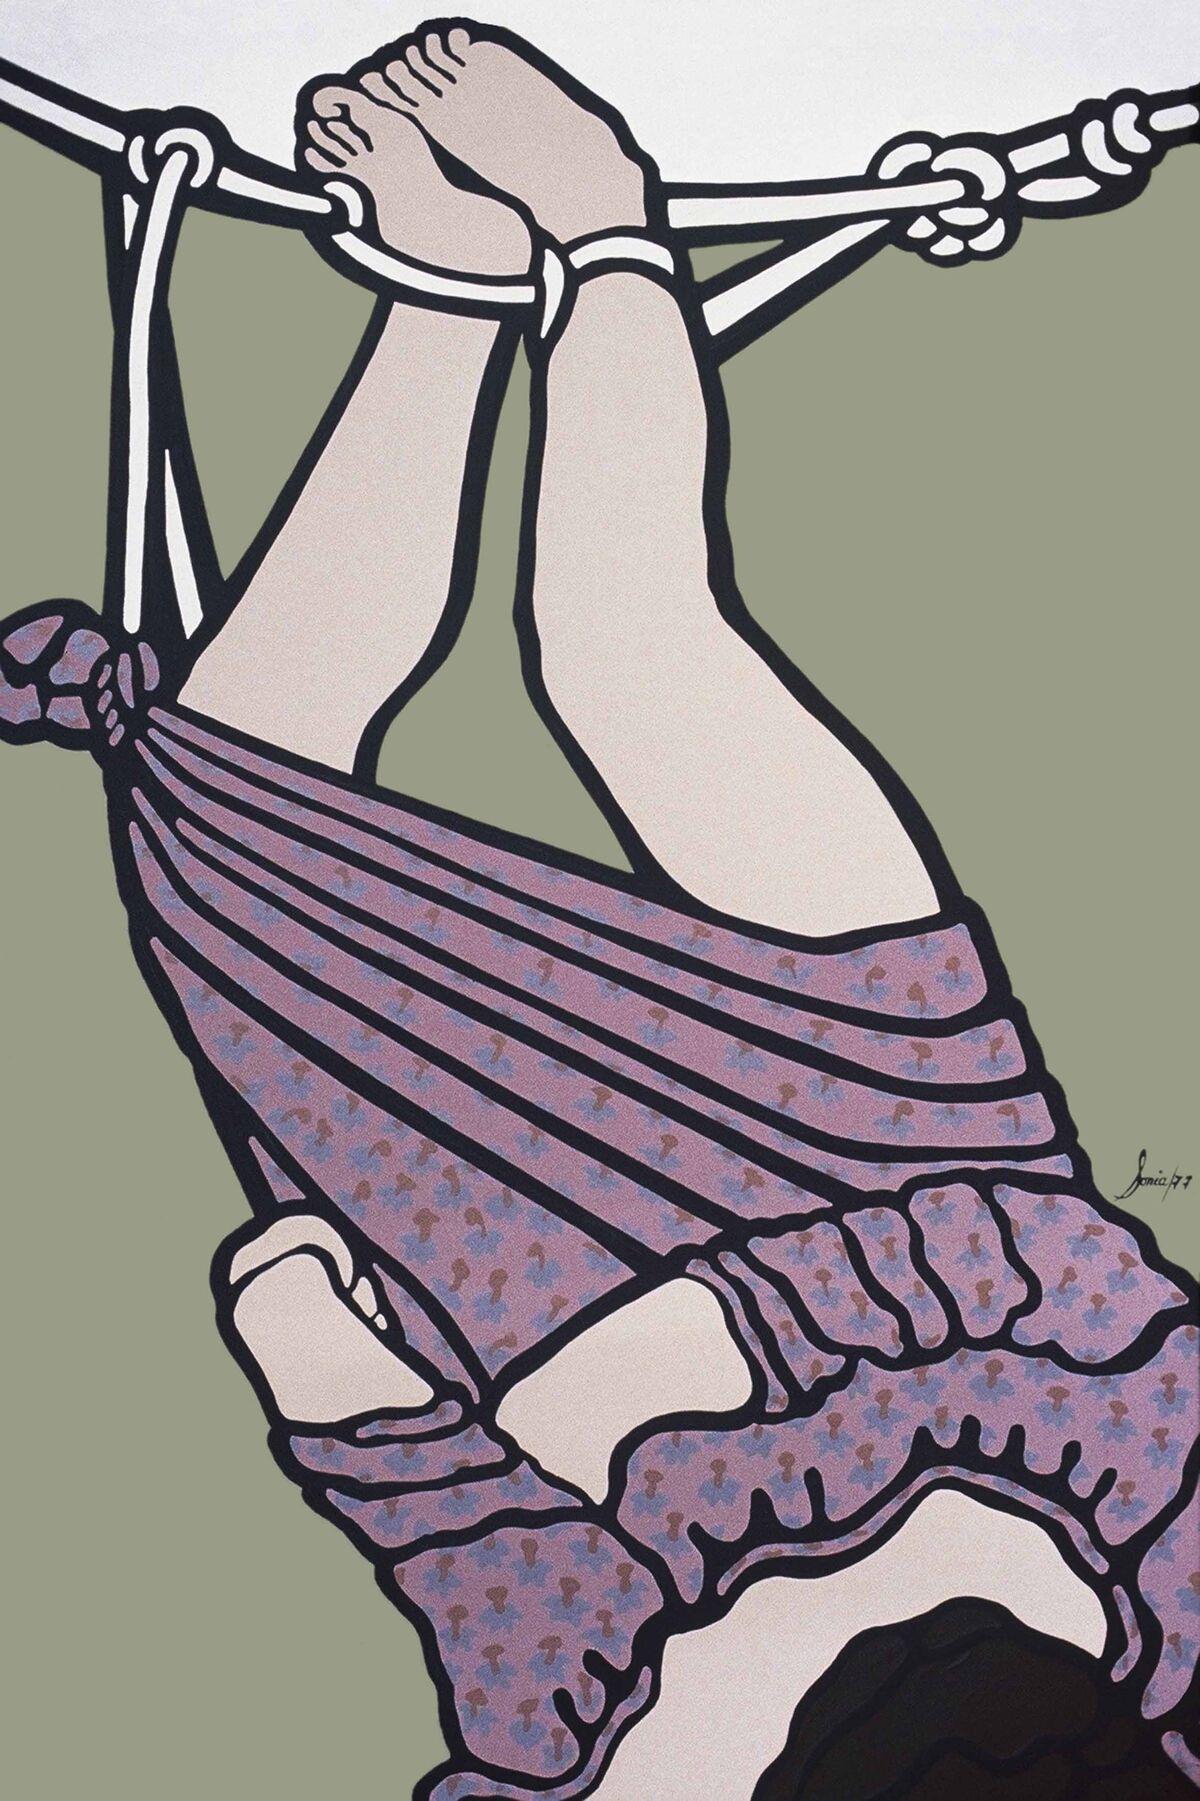 Sonia Gutiérrez, Y con unos lazos me izaron (And they lifted me up with a rope), 1977. Museo de Arte Moderno La Tertulia, Cali, Colombia. © Sonia Gutiérrez. Courtesy of the artist.